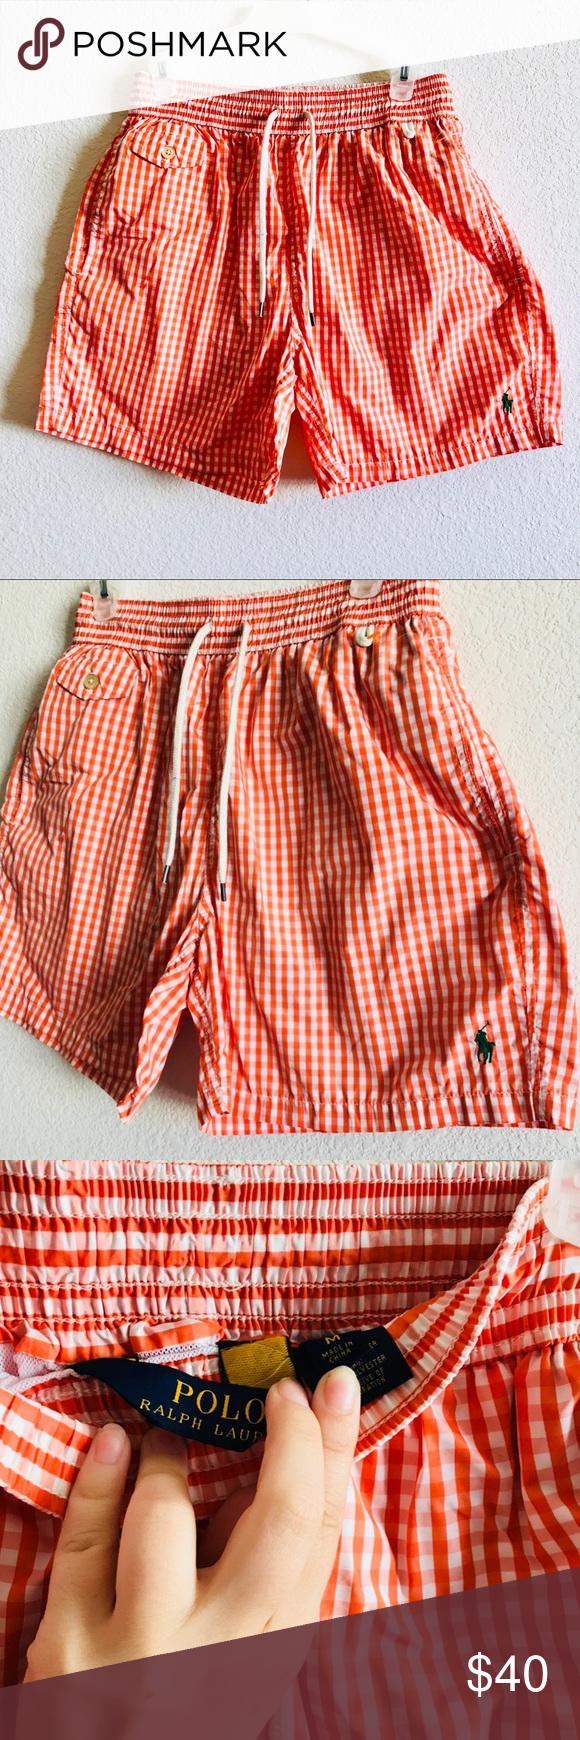 028223b9ee47 ... get vintage polo ralph lauren checkered swim shorts vintage polo by ralph  lauren checkered orange and